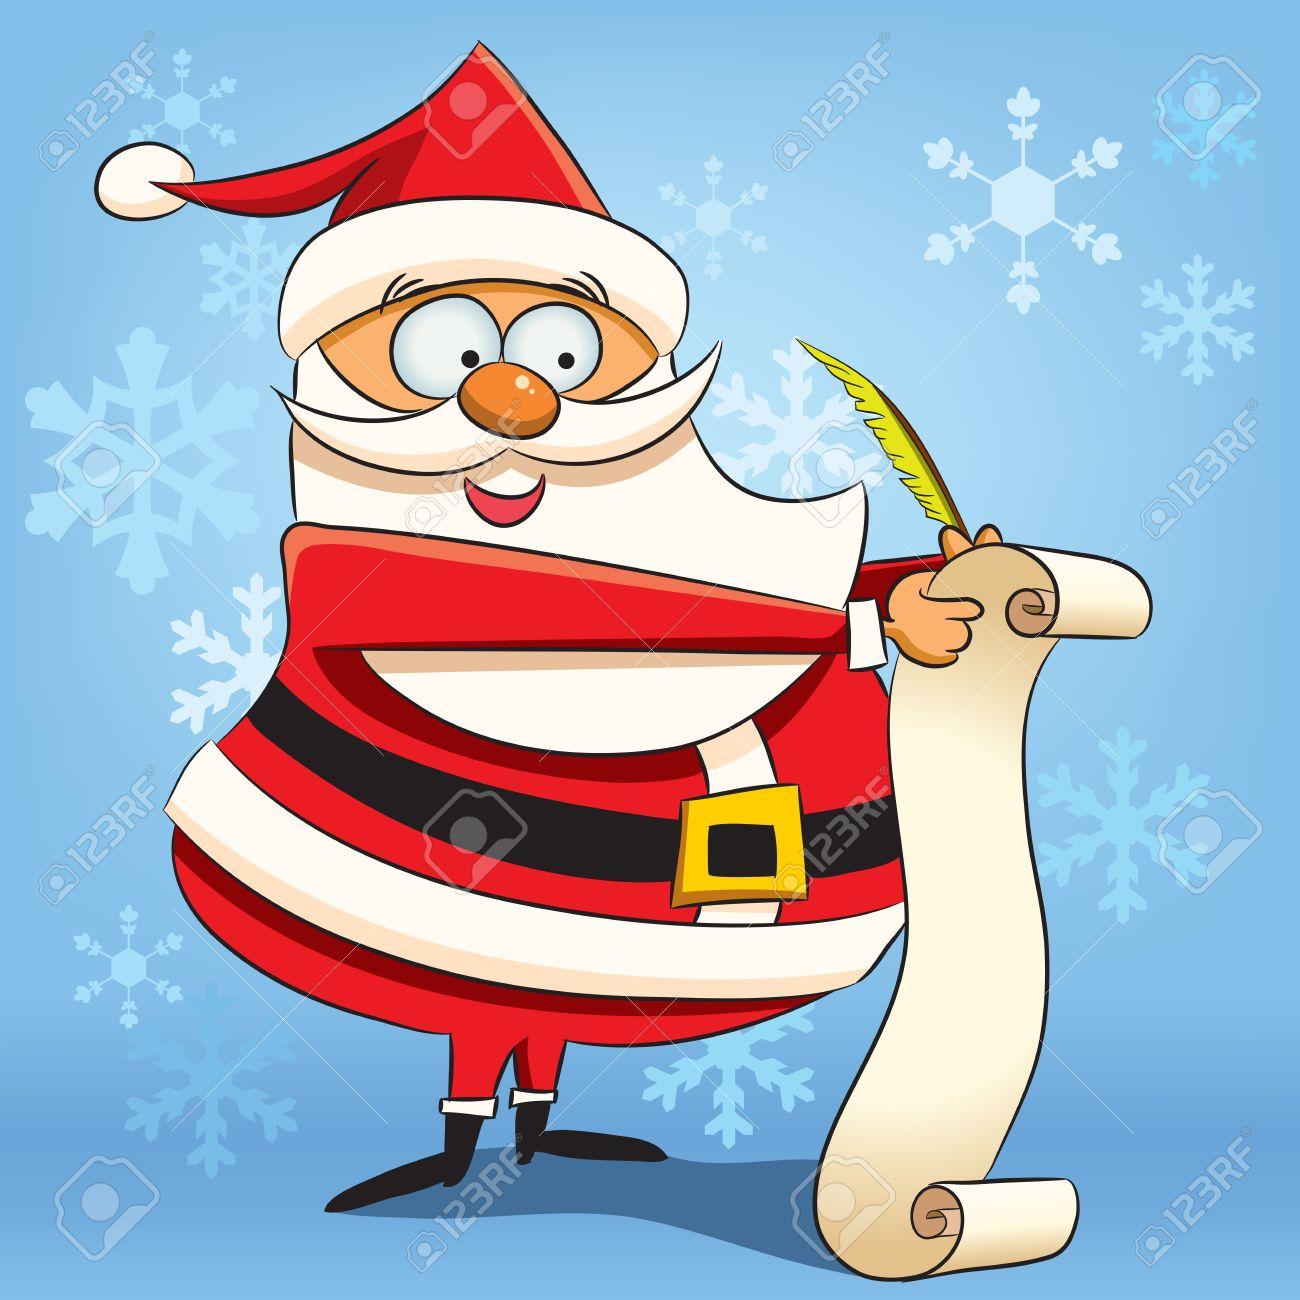 Santas christmas list clipart image Free Christmas Wish List. christmas - elf and his wish list ... image